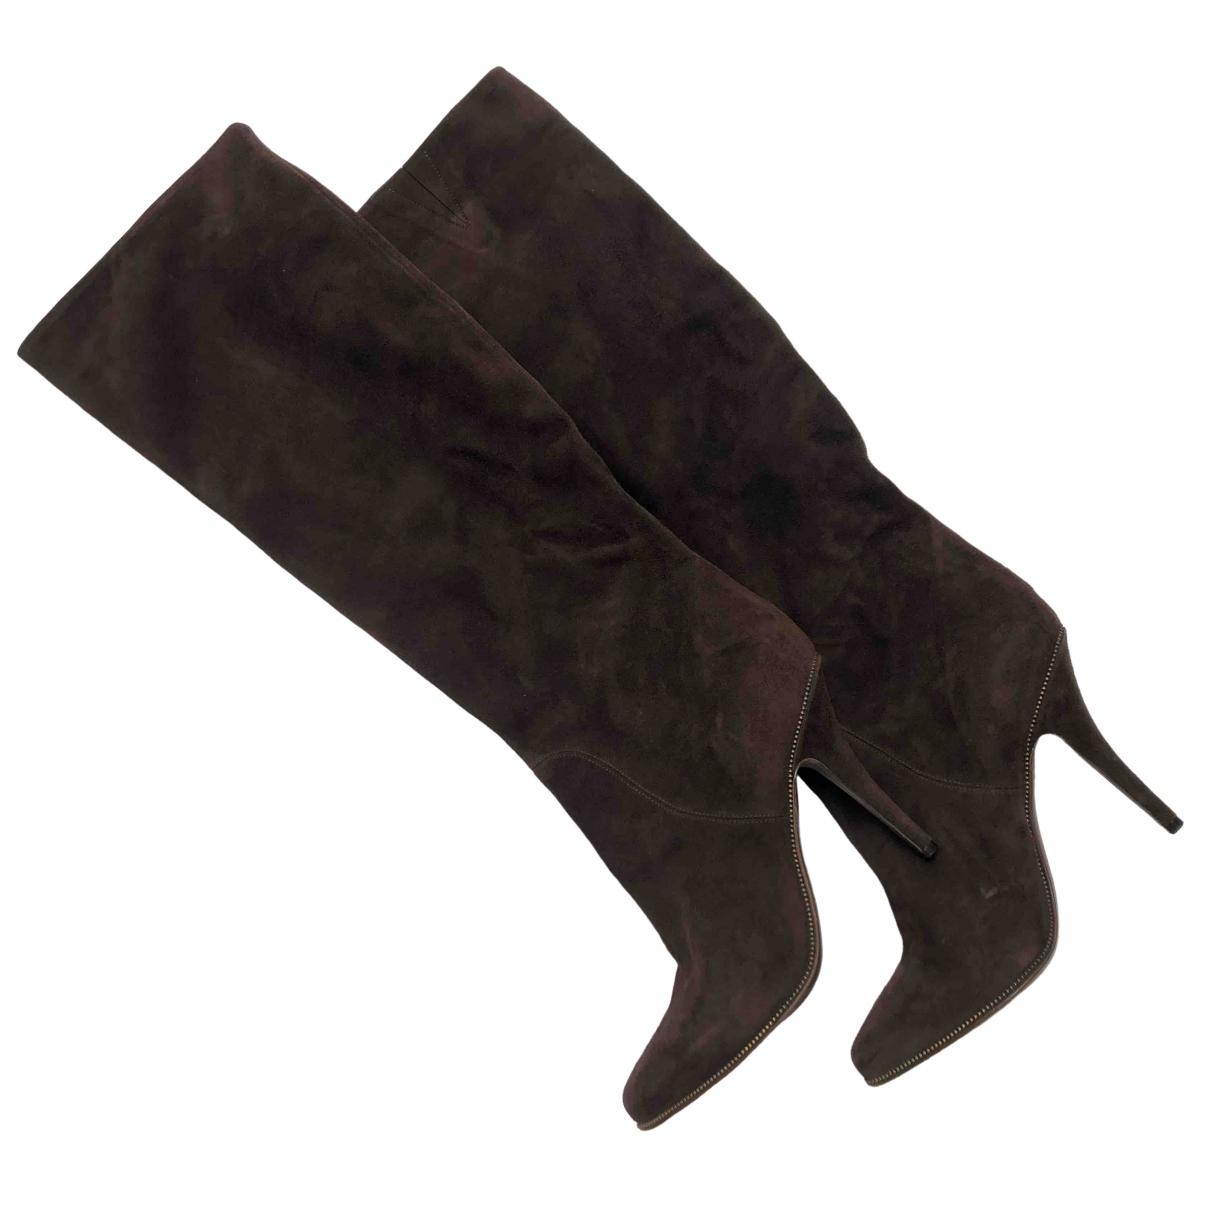 Givenchy \N Stiefel in  Braun Veloursleder